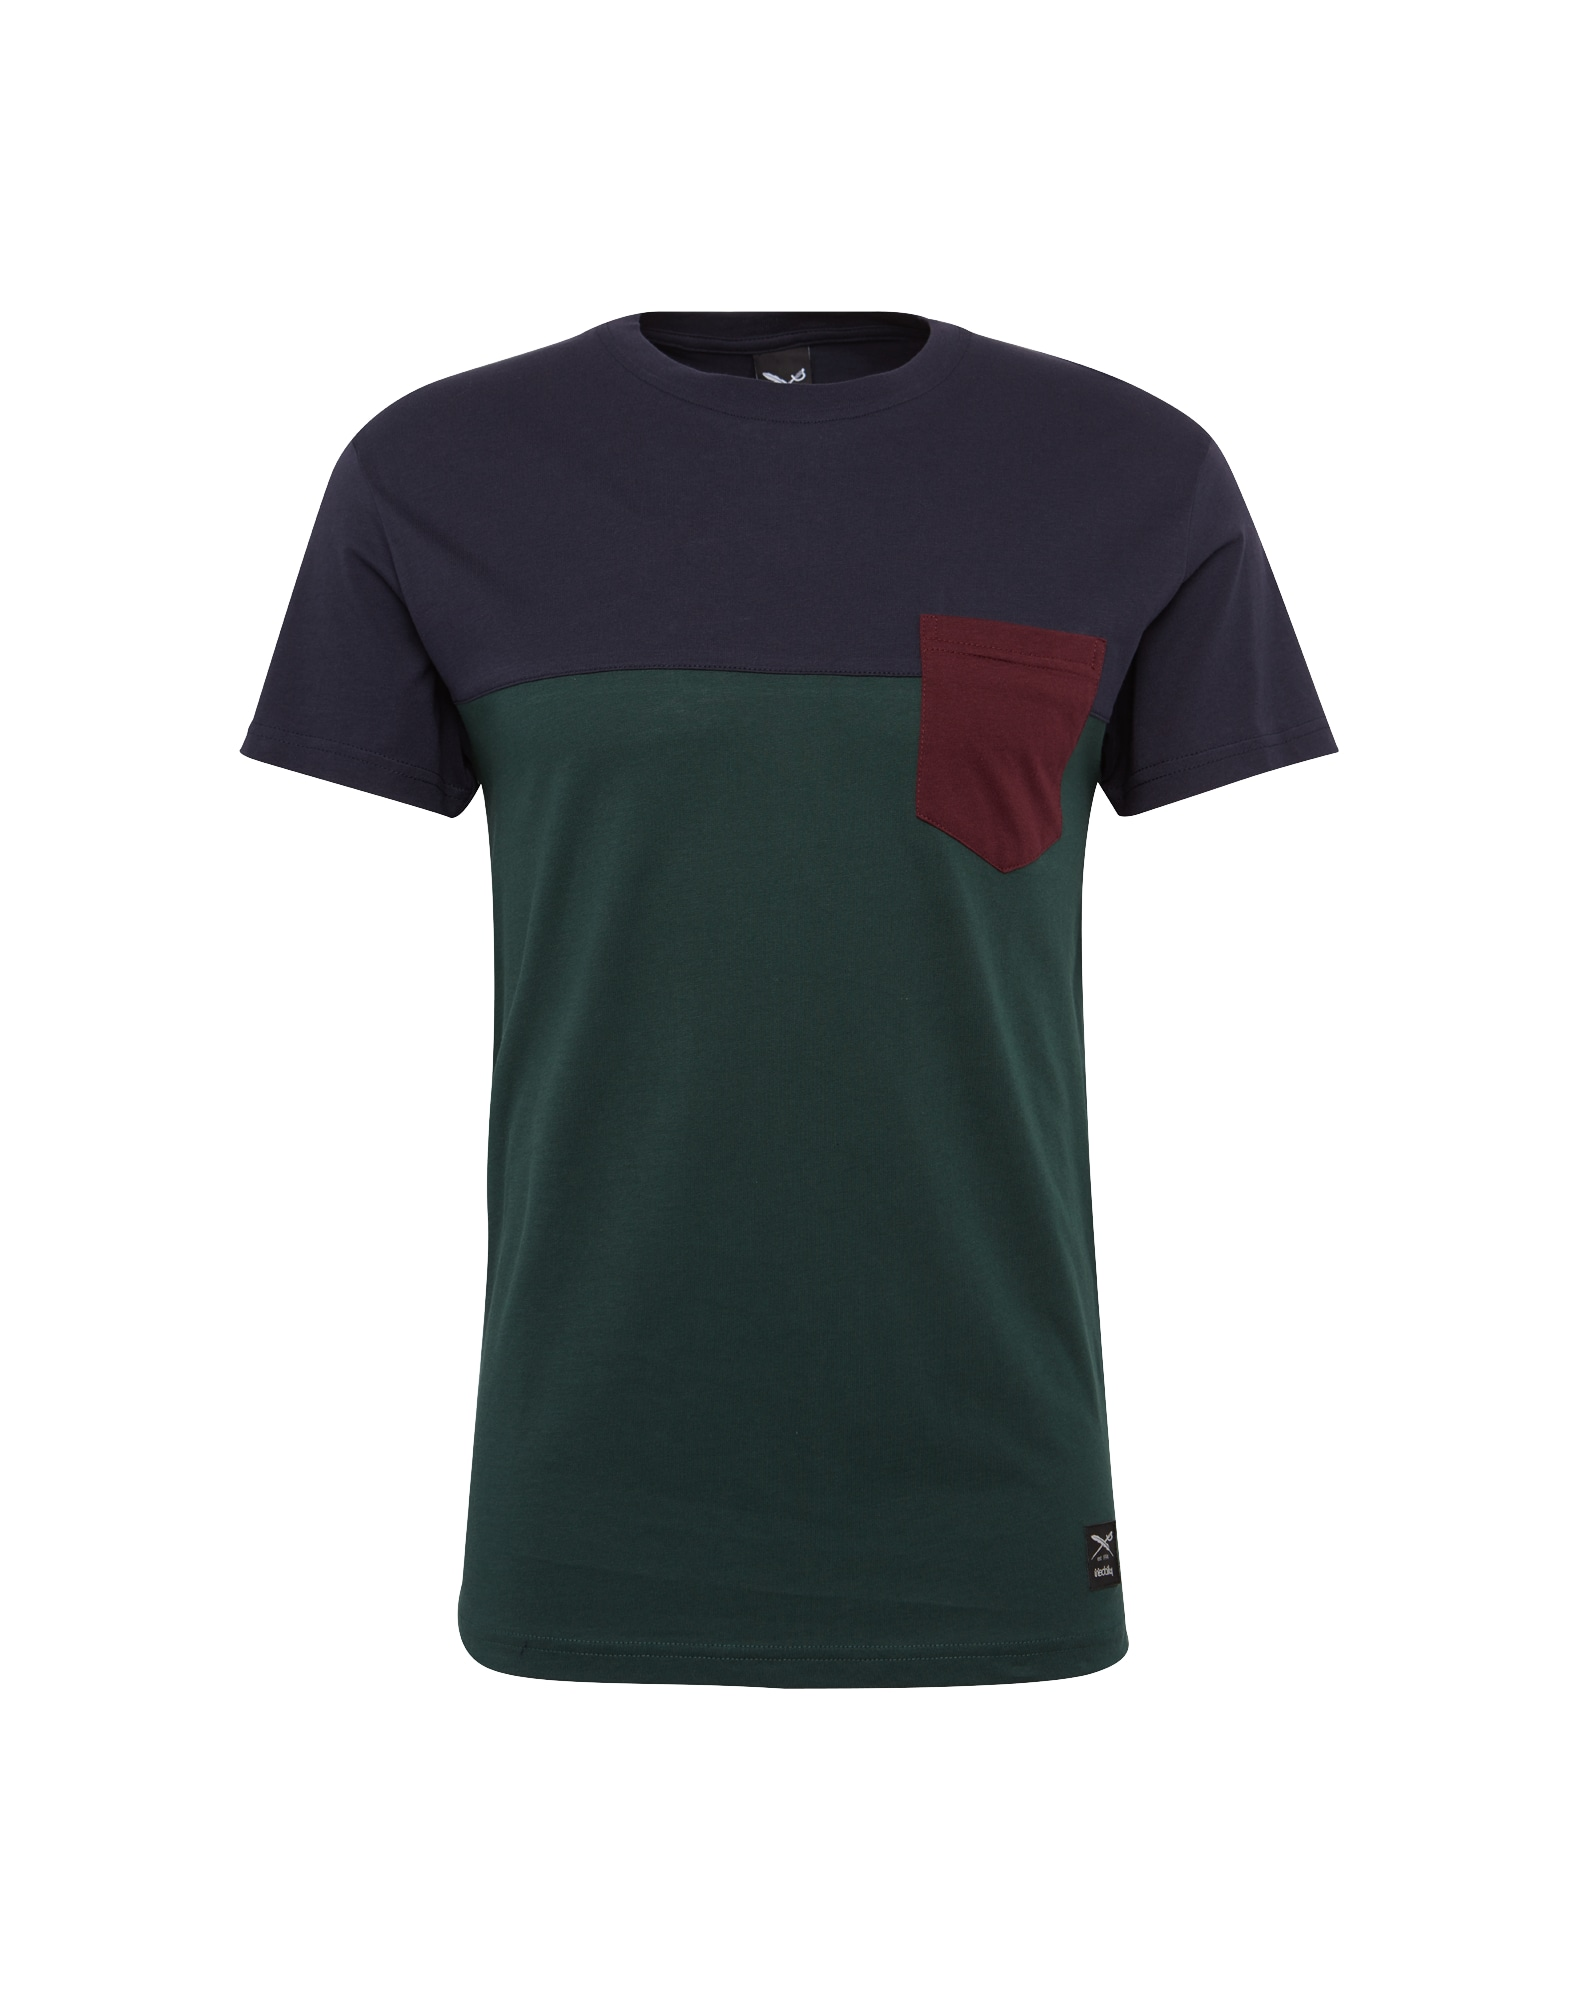 Tričko Block Pocket 2 Tee tmavě modrá tmavě zelená bordó Iriedaily